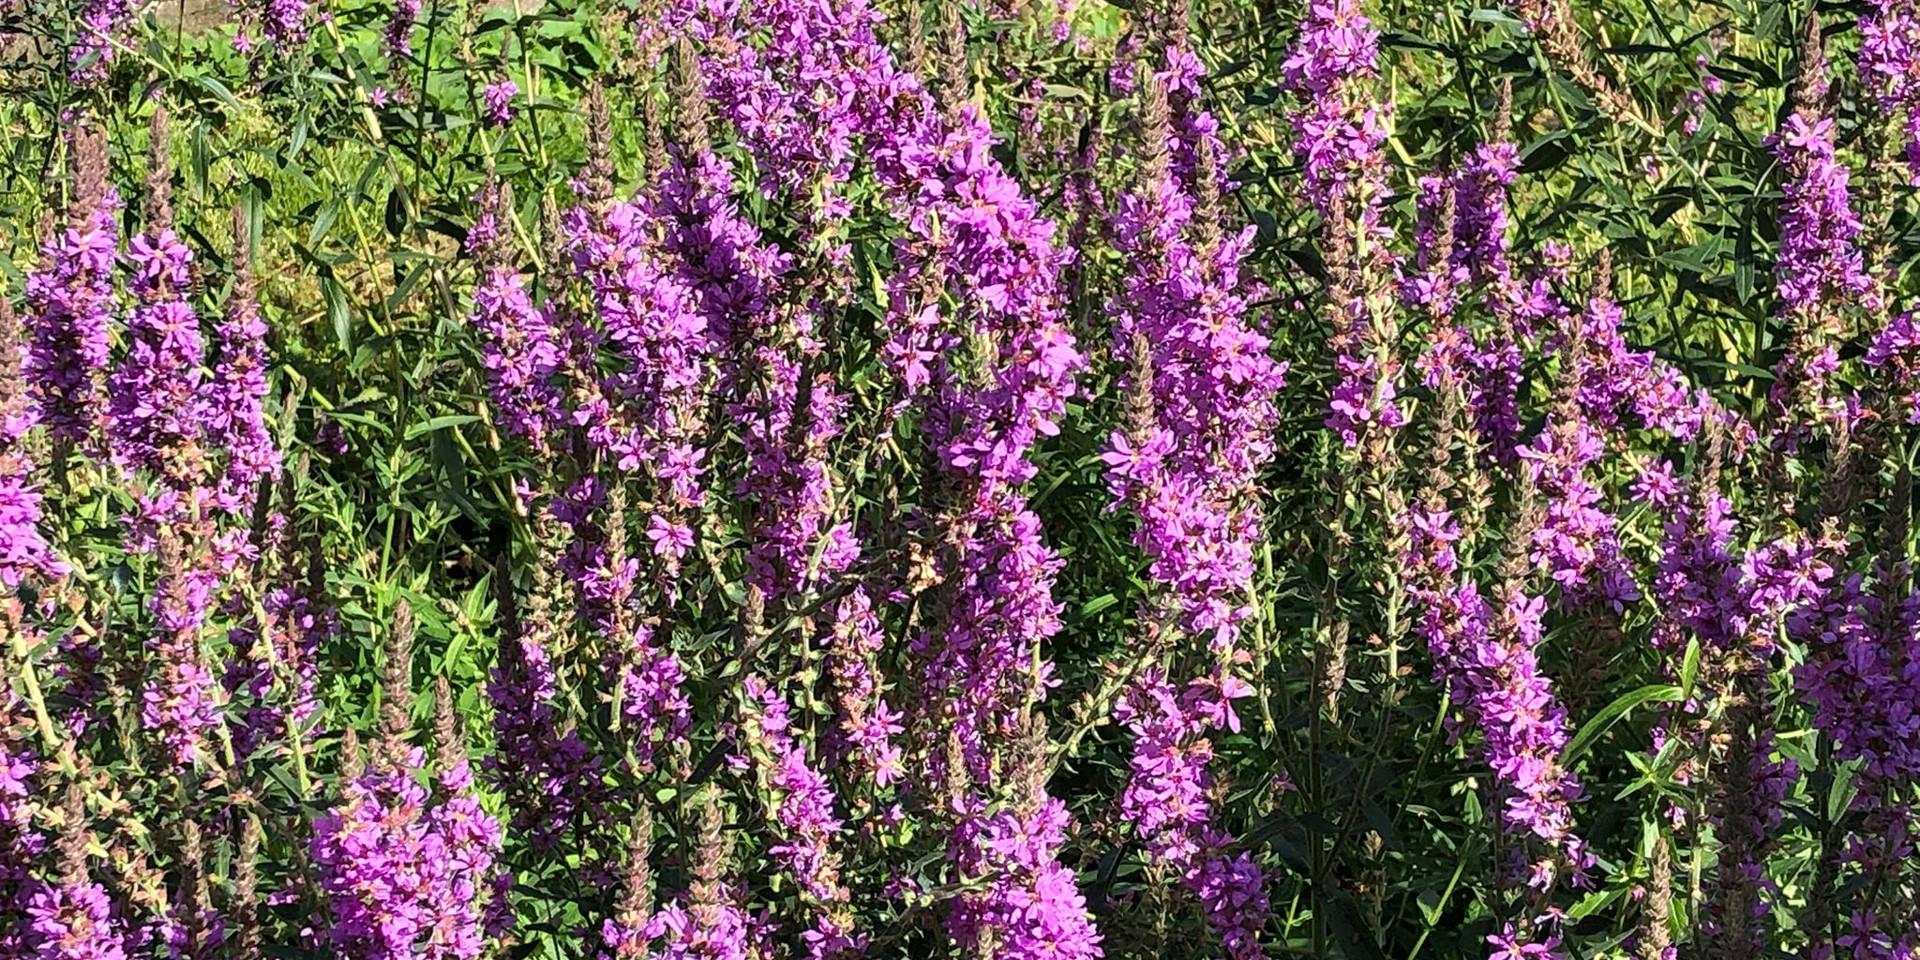 Wild growing lavender